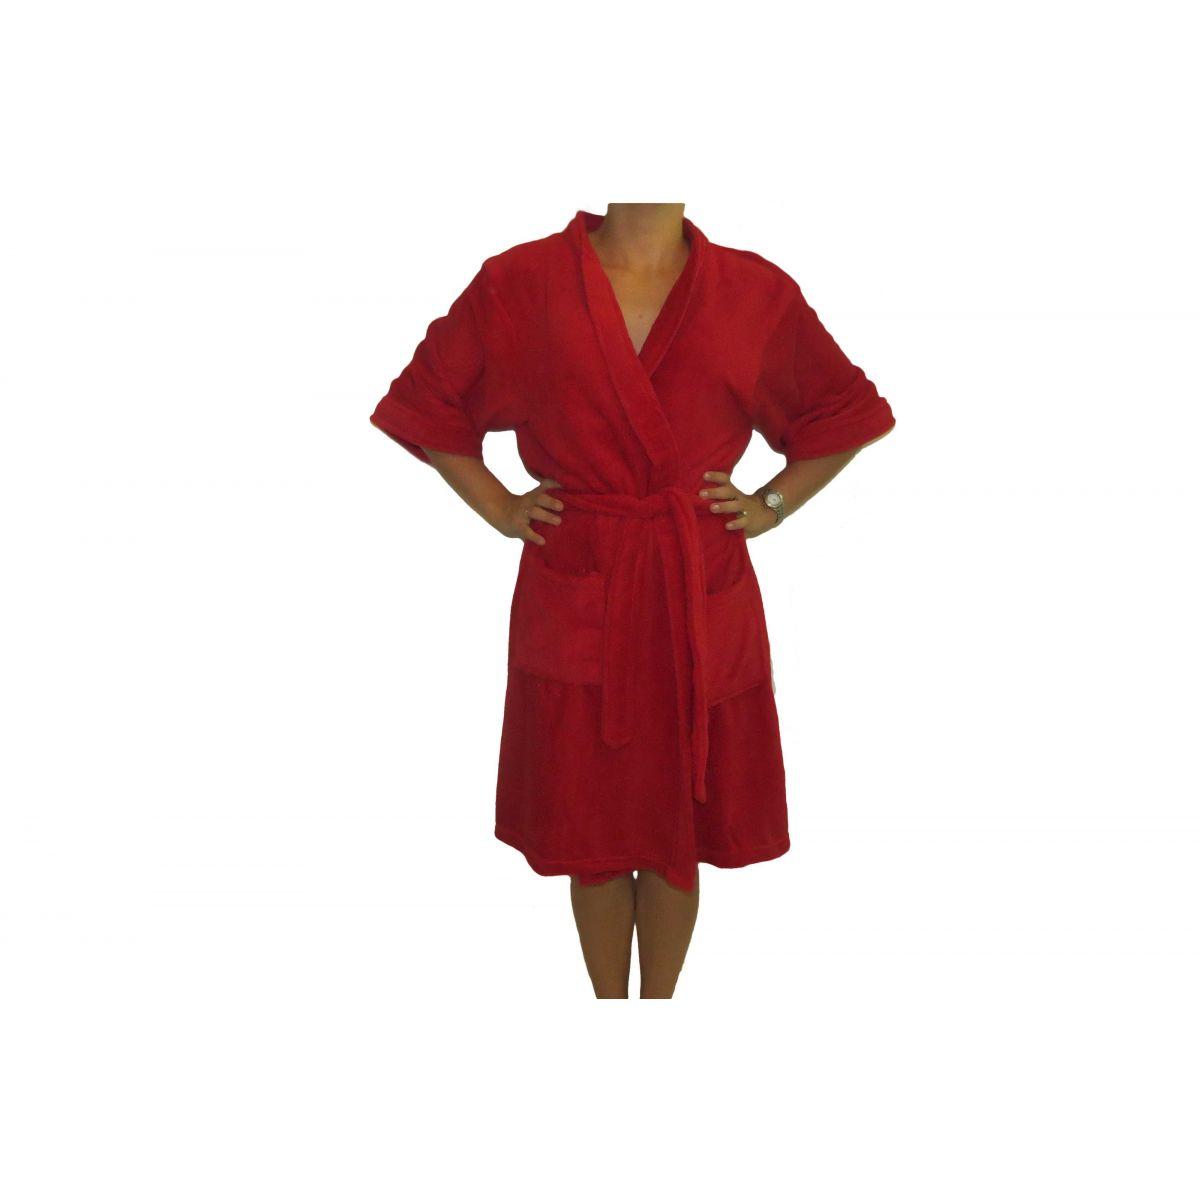 Roupão Microfibra Sofisticata Kimono Vermelho M Atlântica